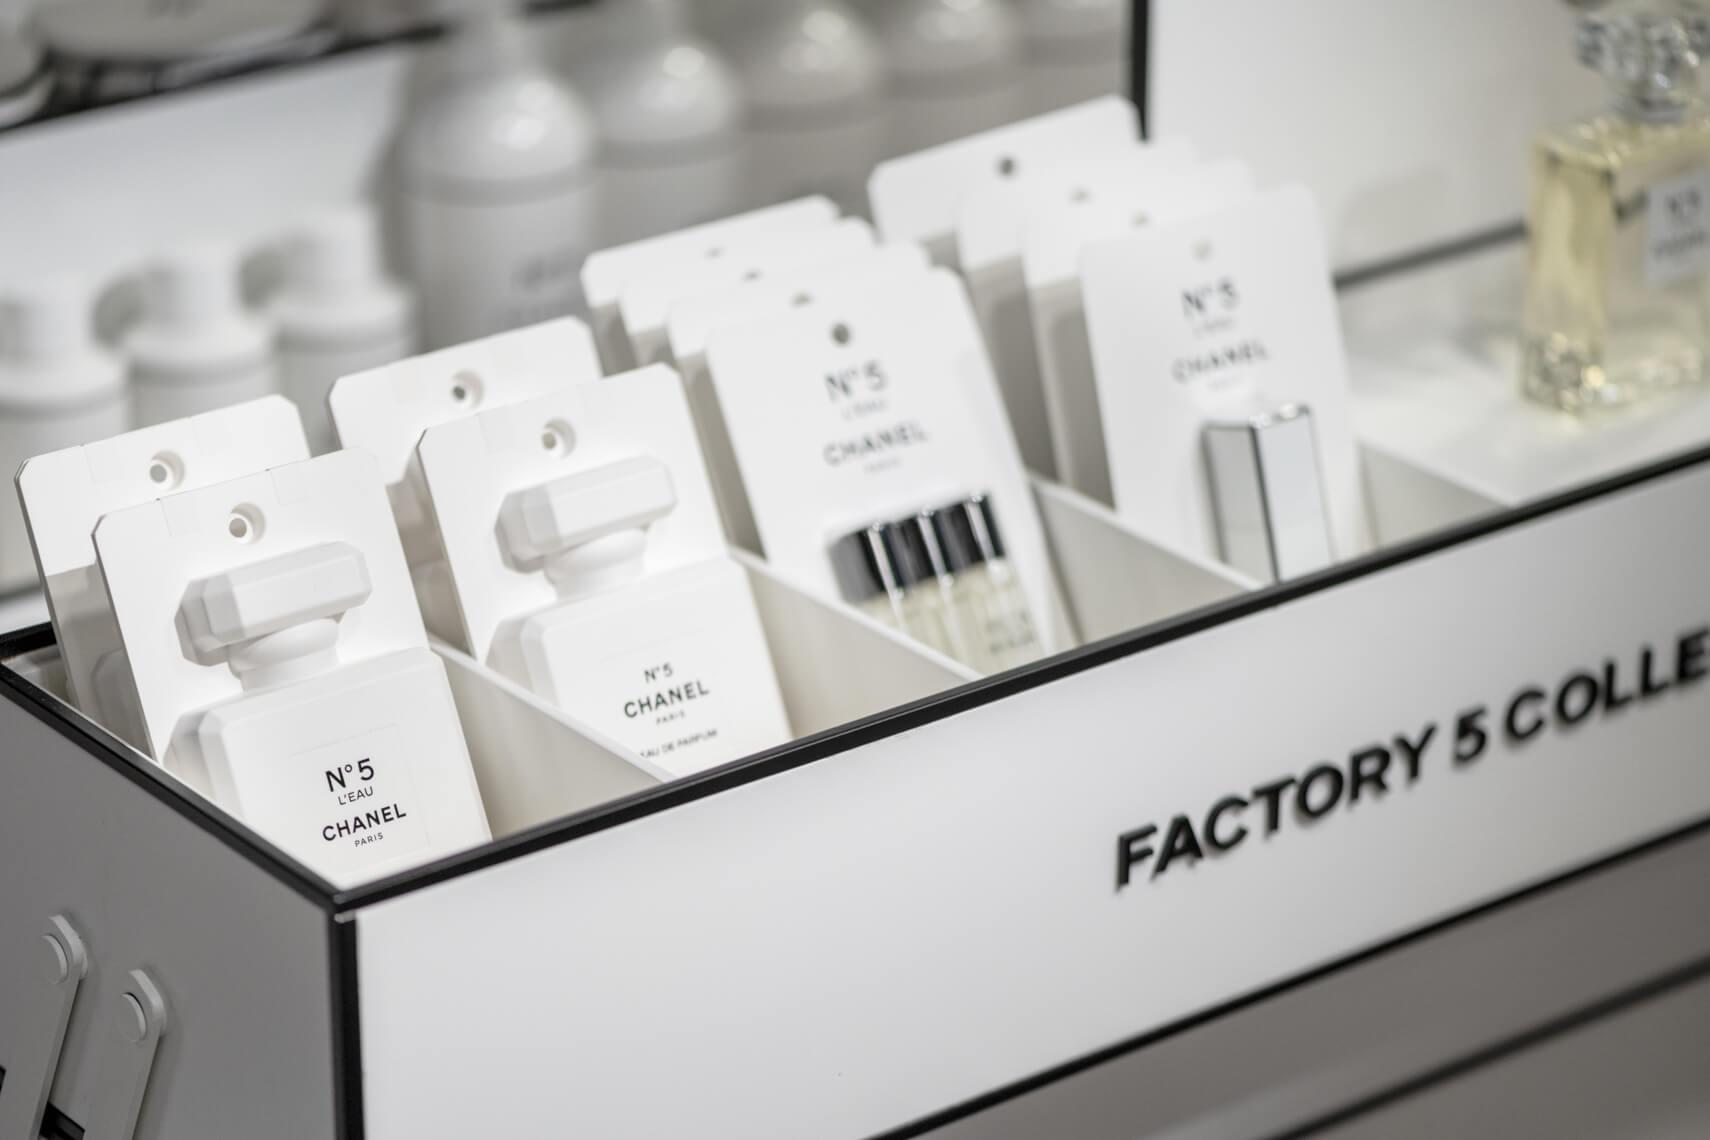 Kultowa N°5 kończy 100 lat - kolekcja Chanel Factory 5